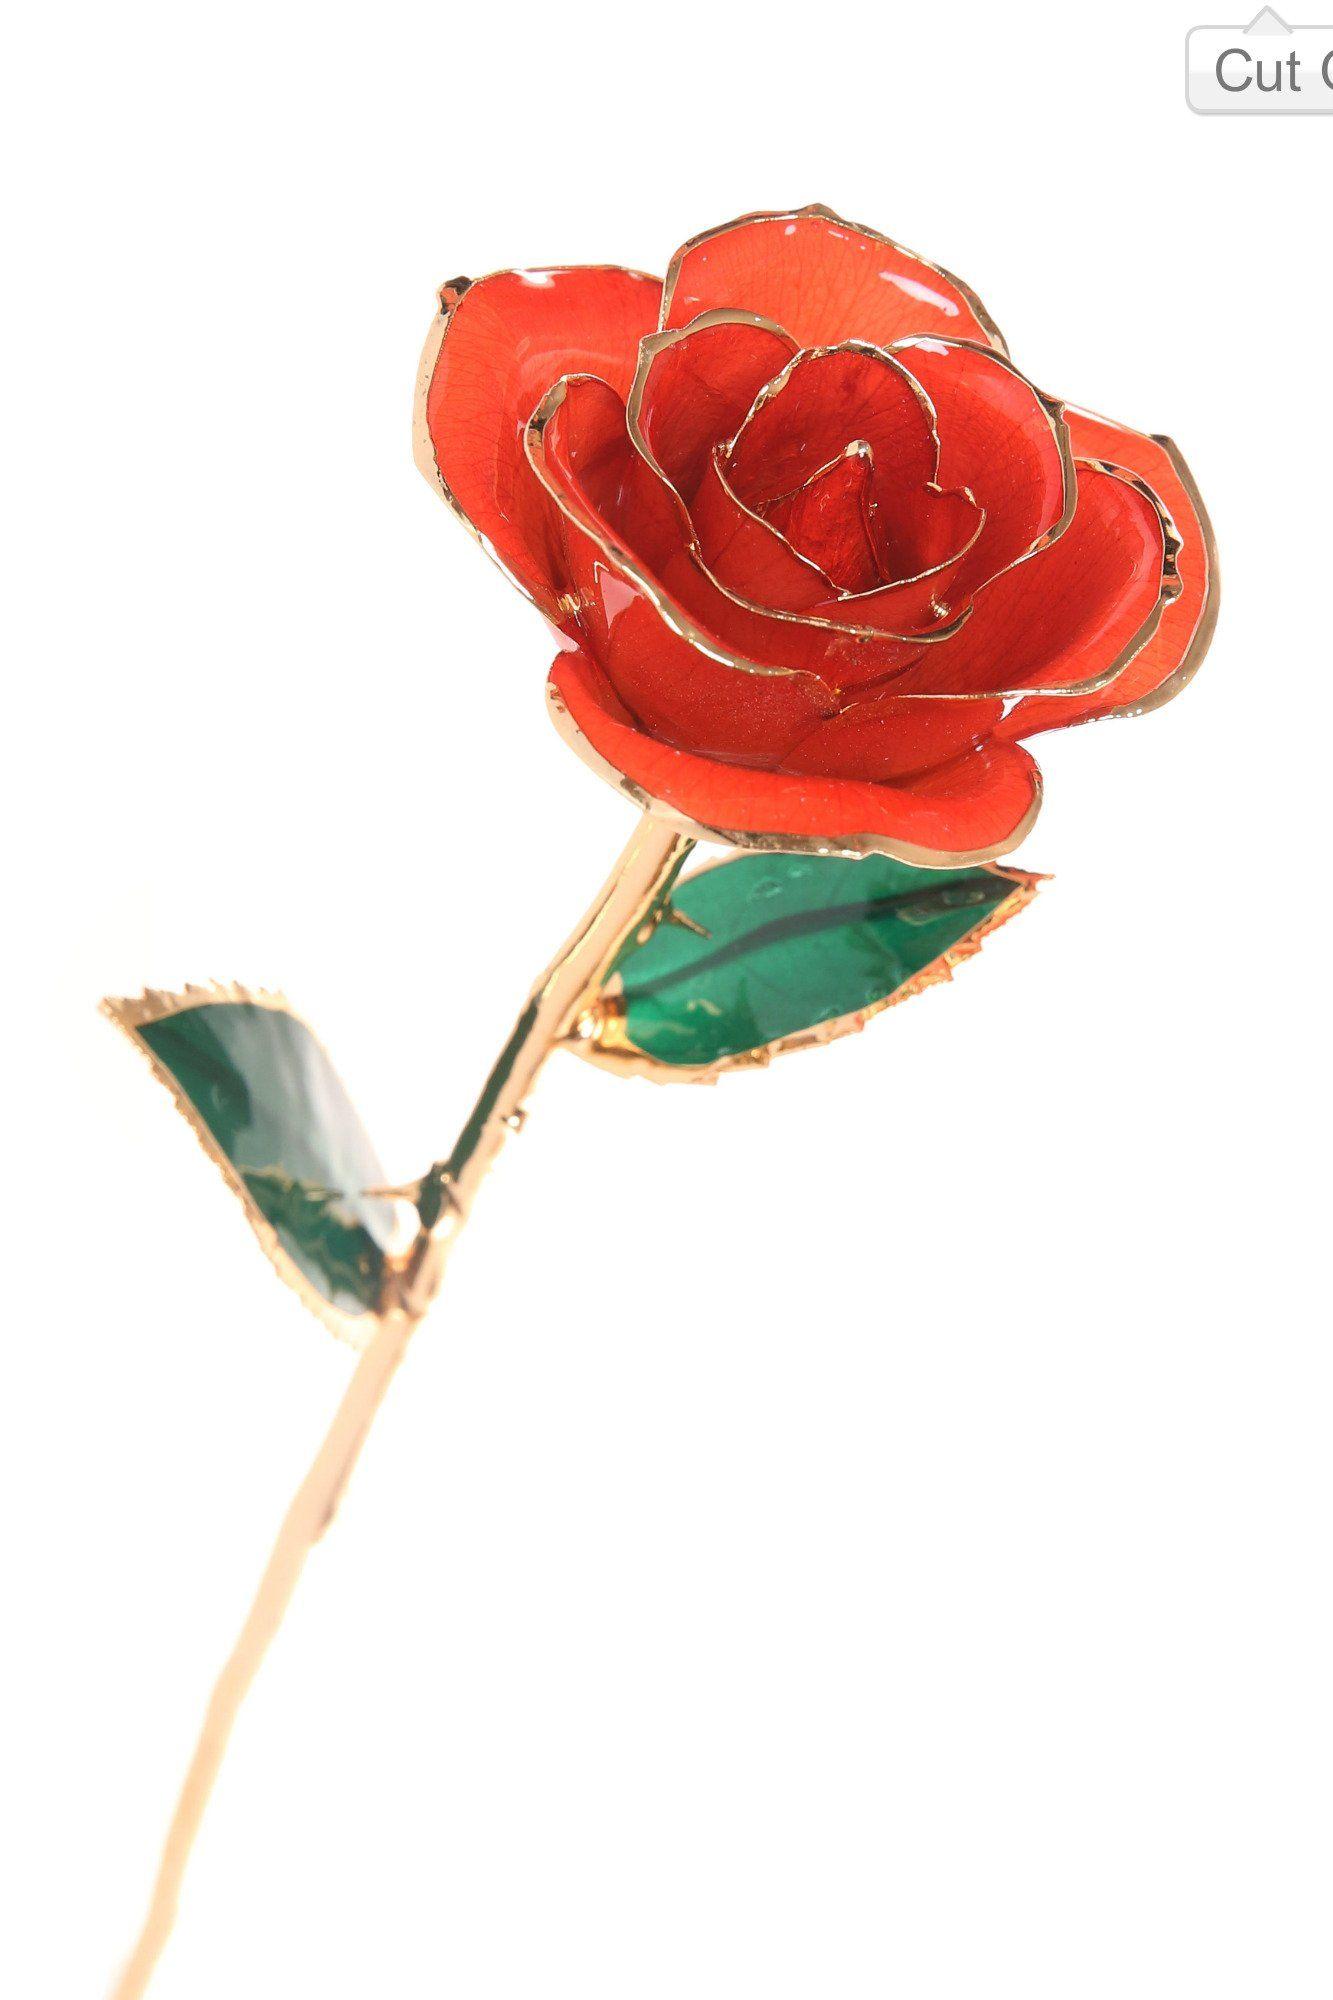 Durarose everlasting long stem red orange rose dipped in